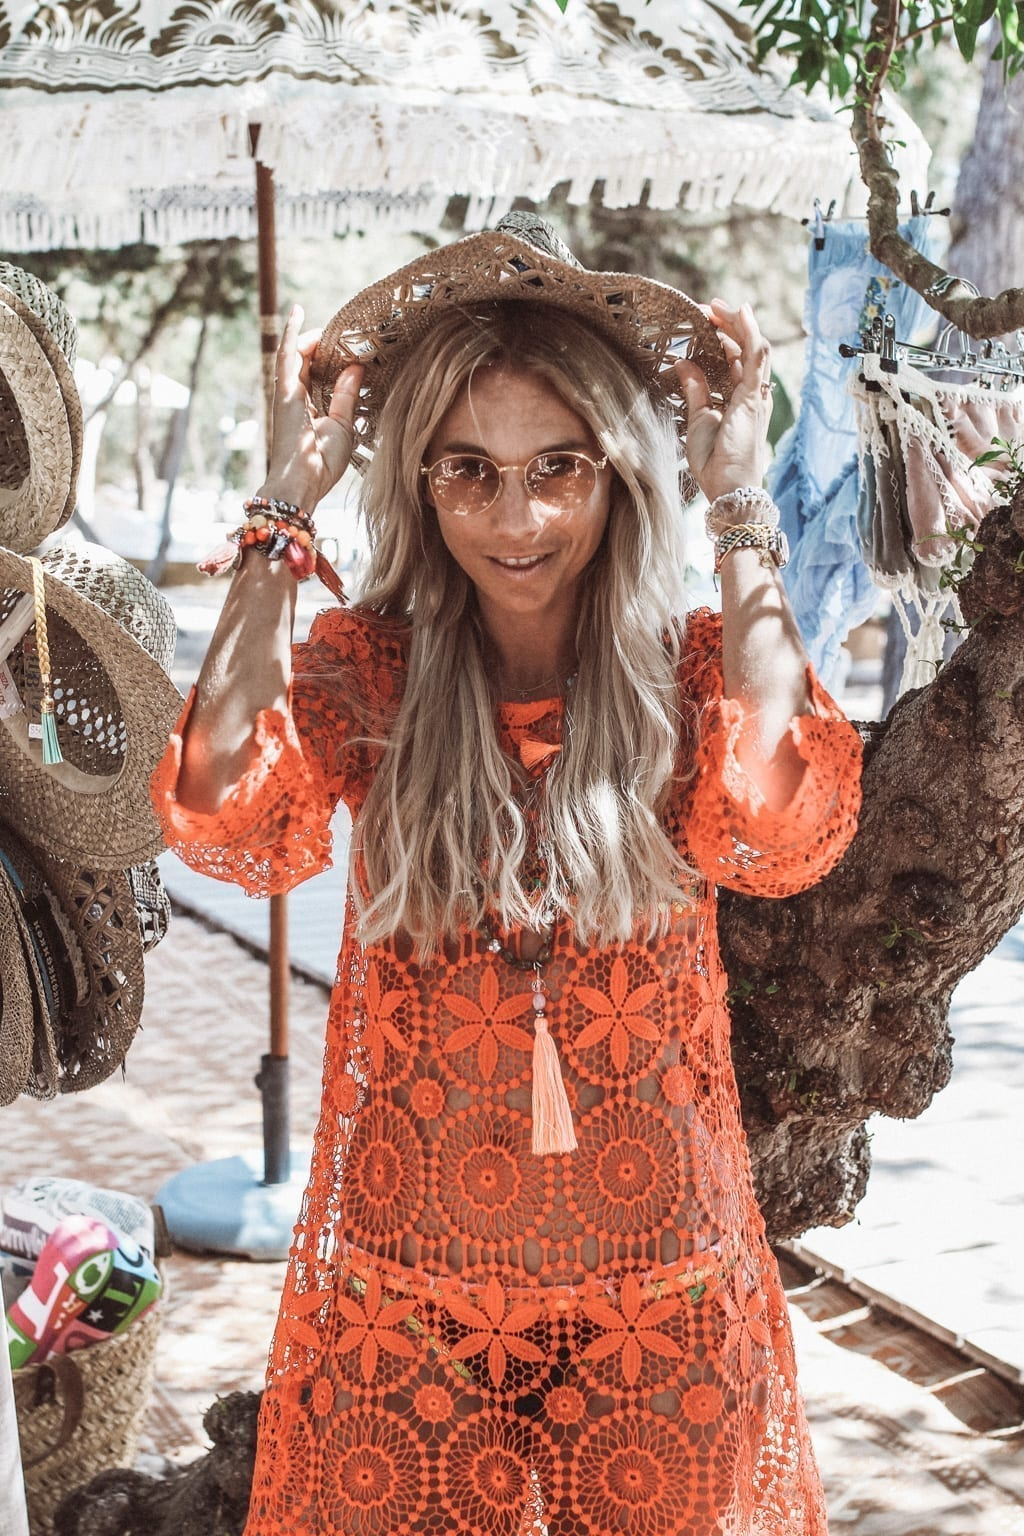 CK1603_Constantly-K-Karin-Kaswurm-Ibiza-Beach-Hippie-Boho-Style-Blog-7934